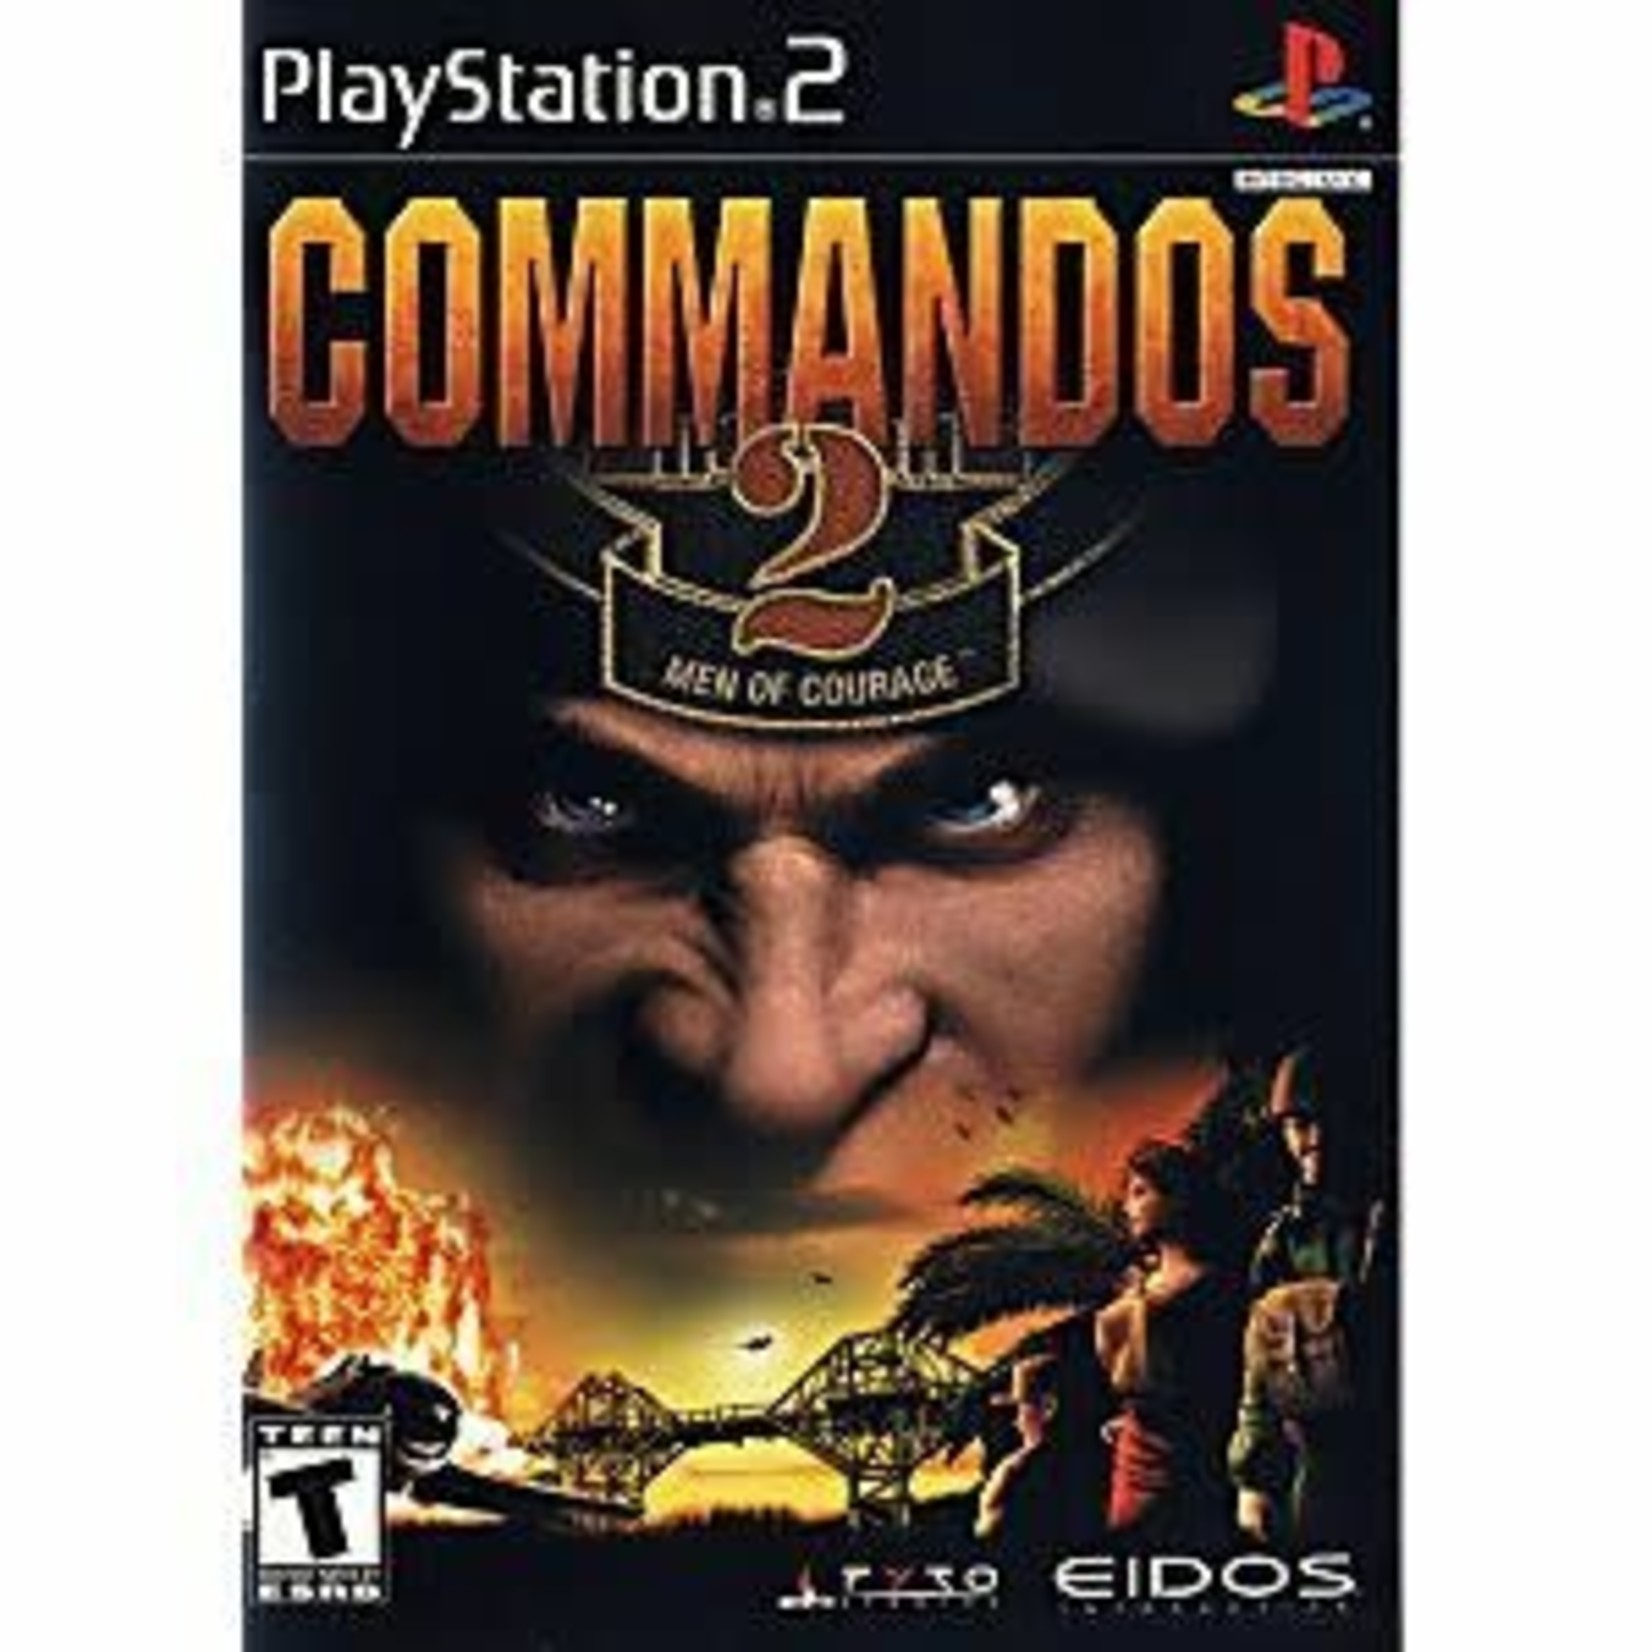 PS2U-COMMANDOS 2 MEN OF COURAGE